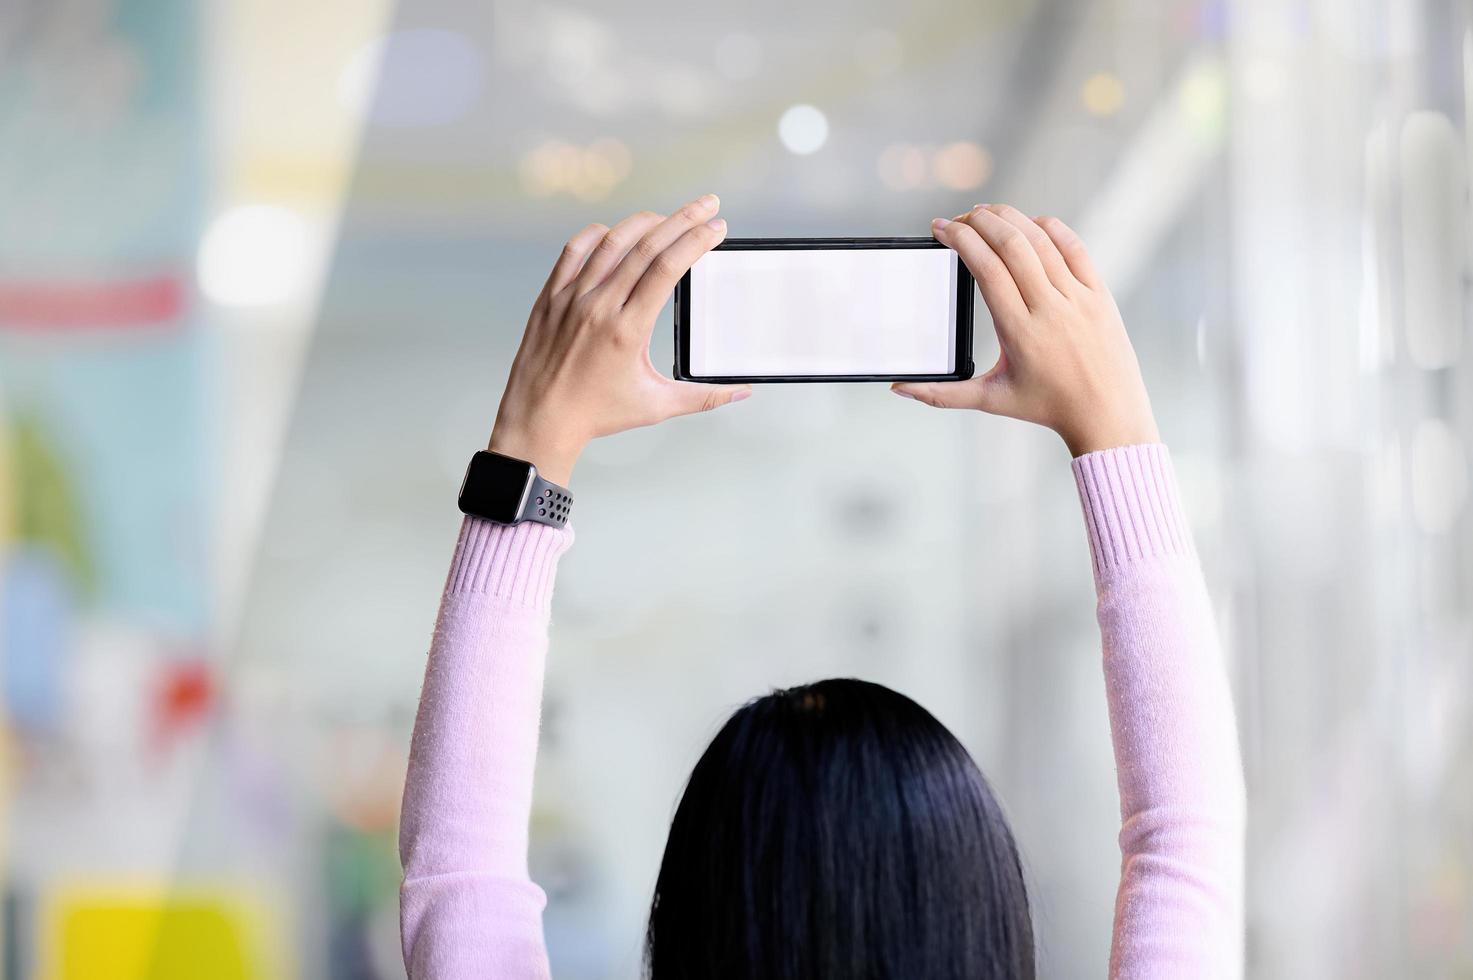 main féminine tenant un téléphone intelligent photo